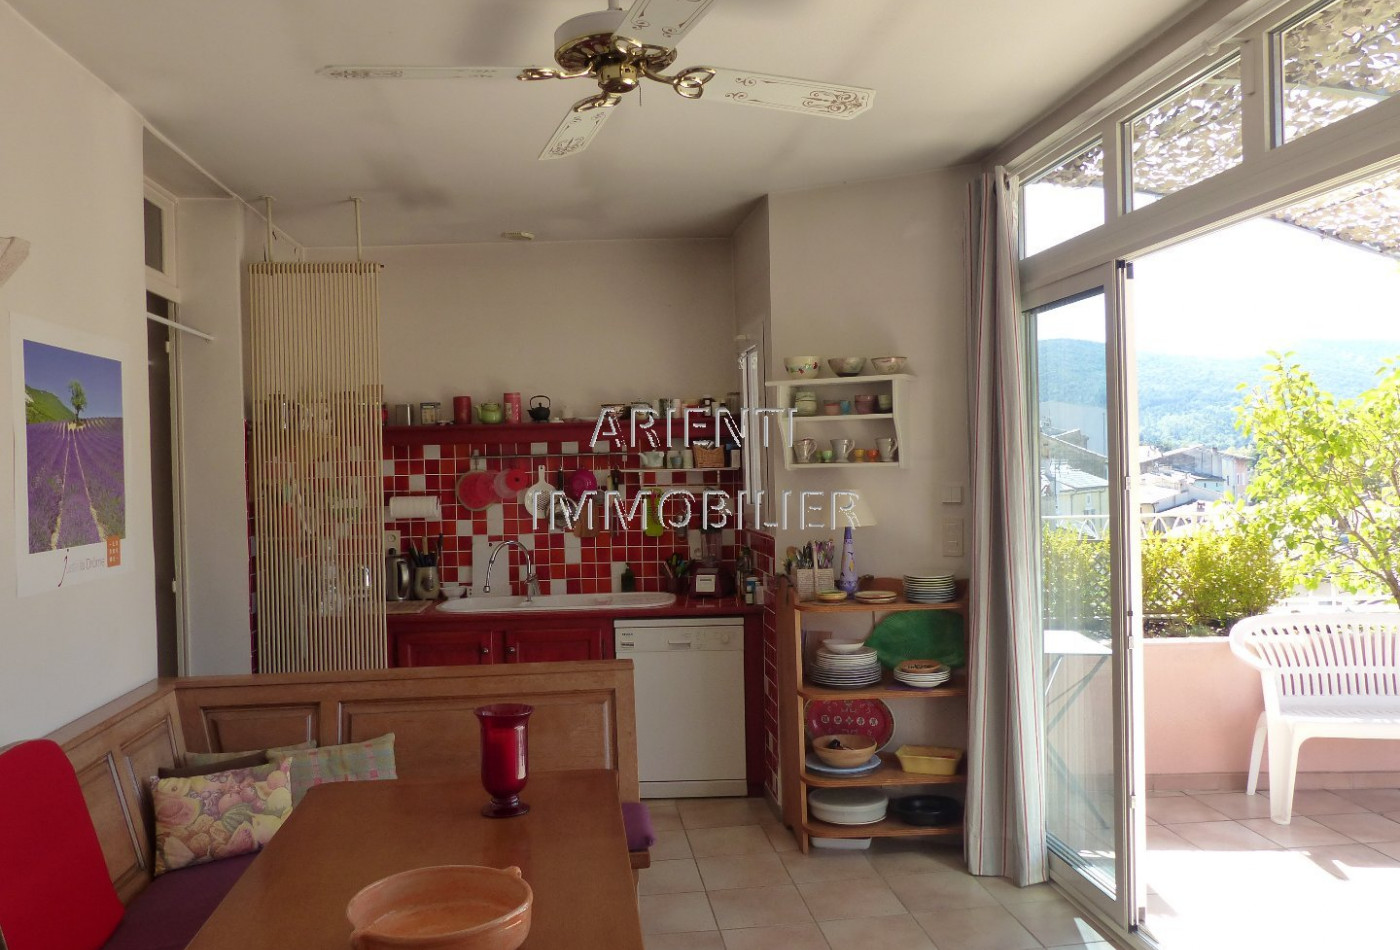 A vendre Dieulefit 260012814 Office immobilier arienti